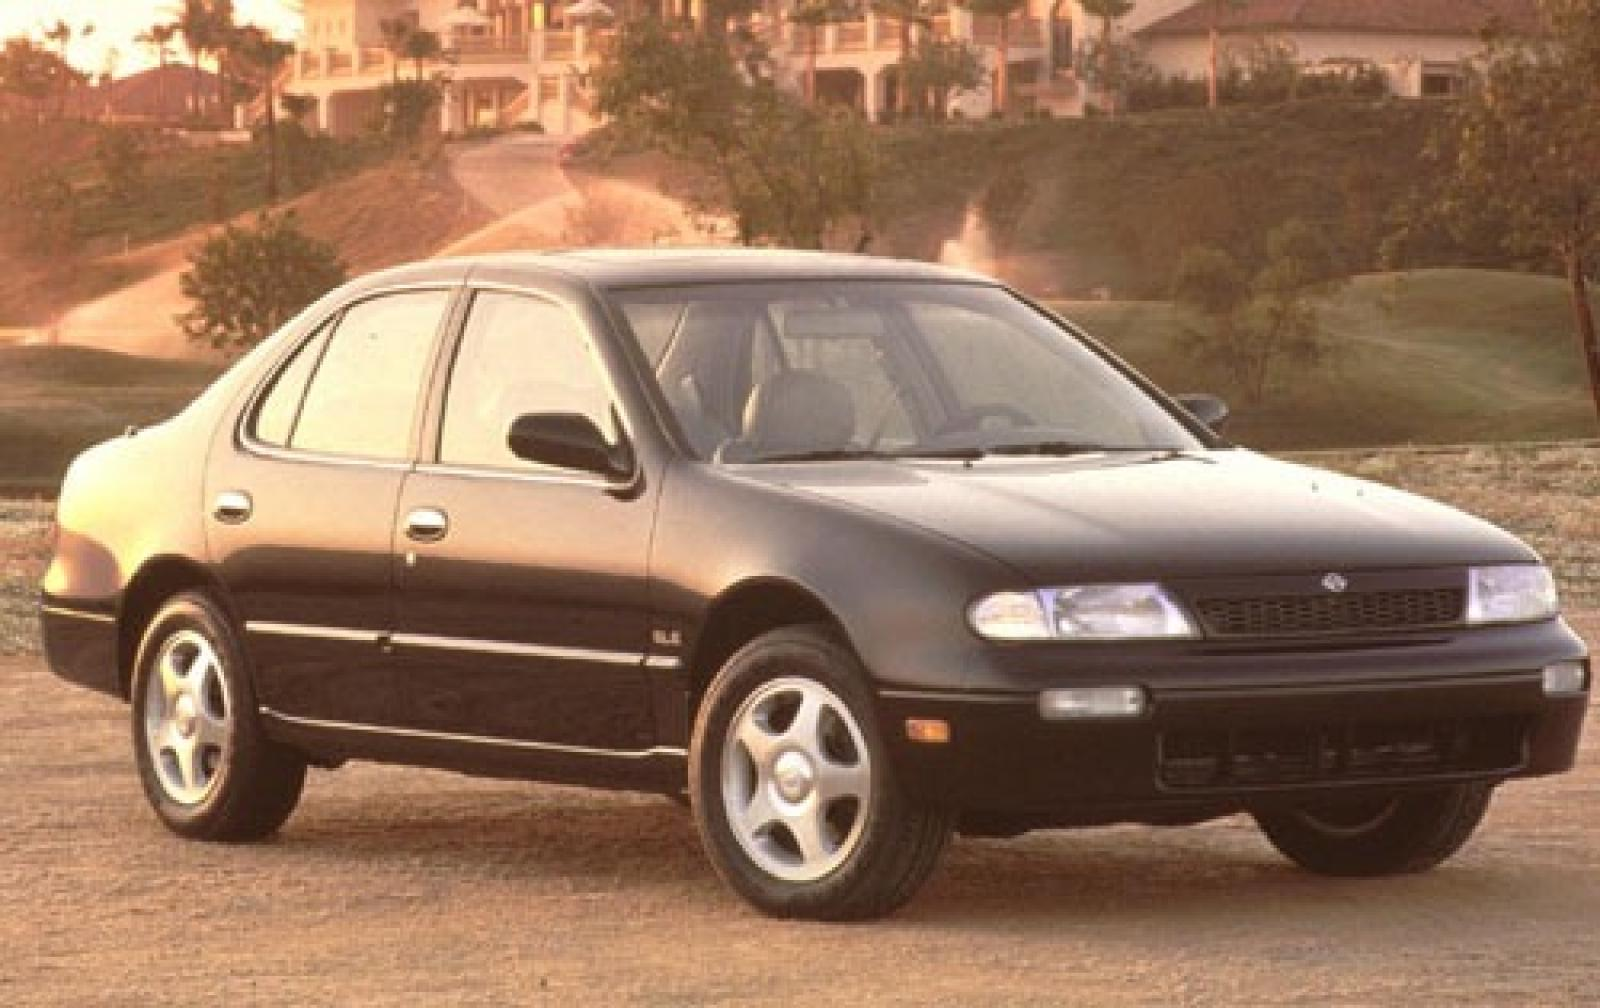 800 1024 1280 1600 Origin 1996 Nissan Altima